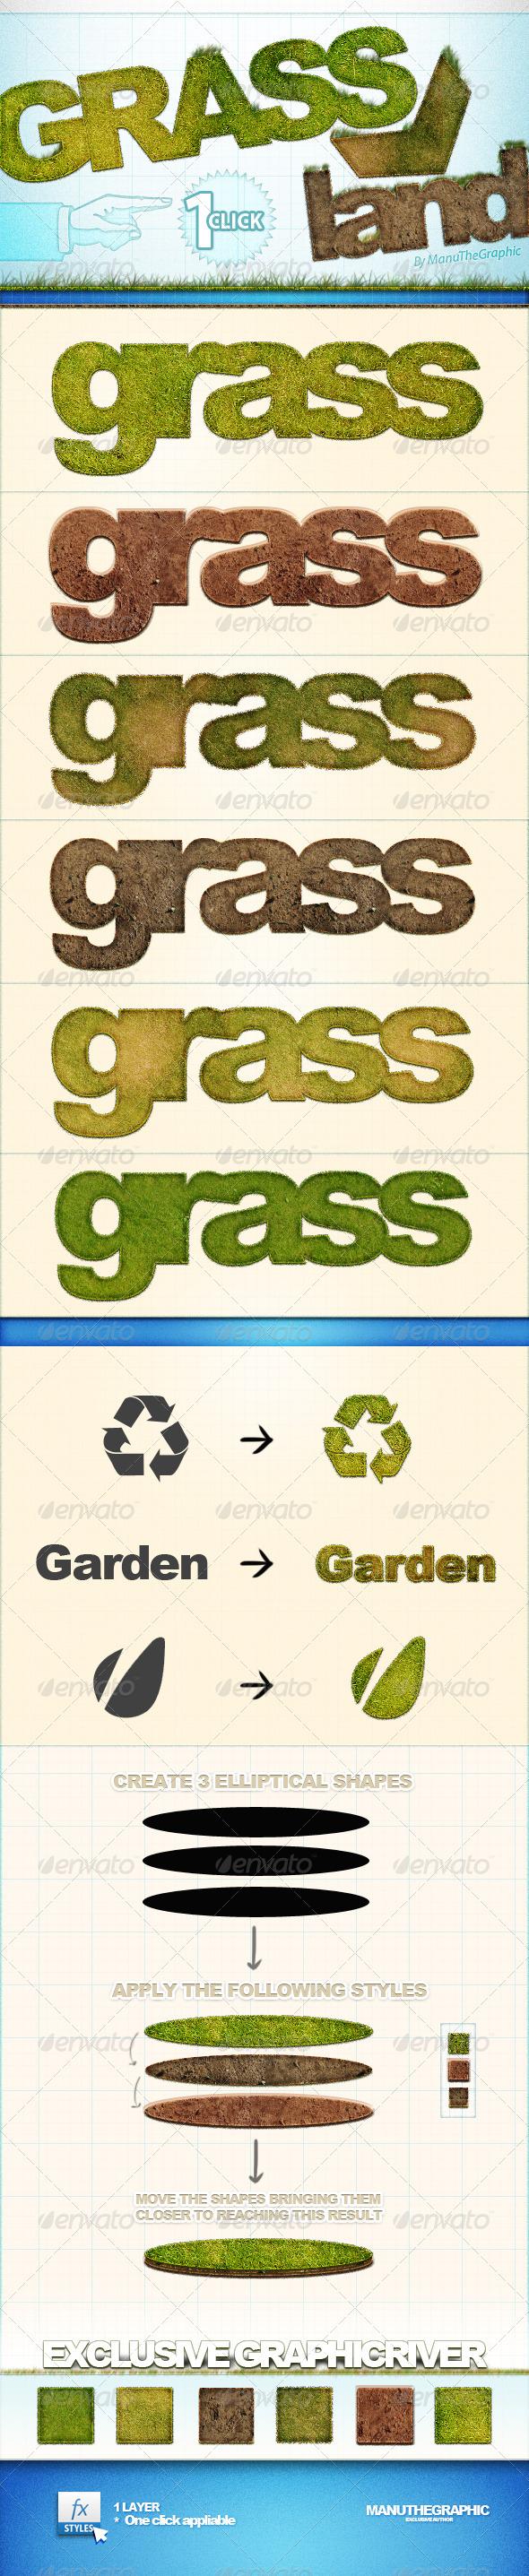 GrassAndLand Styles - Text Effects Styles